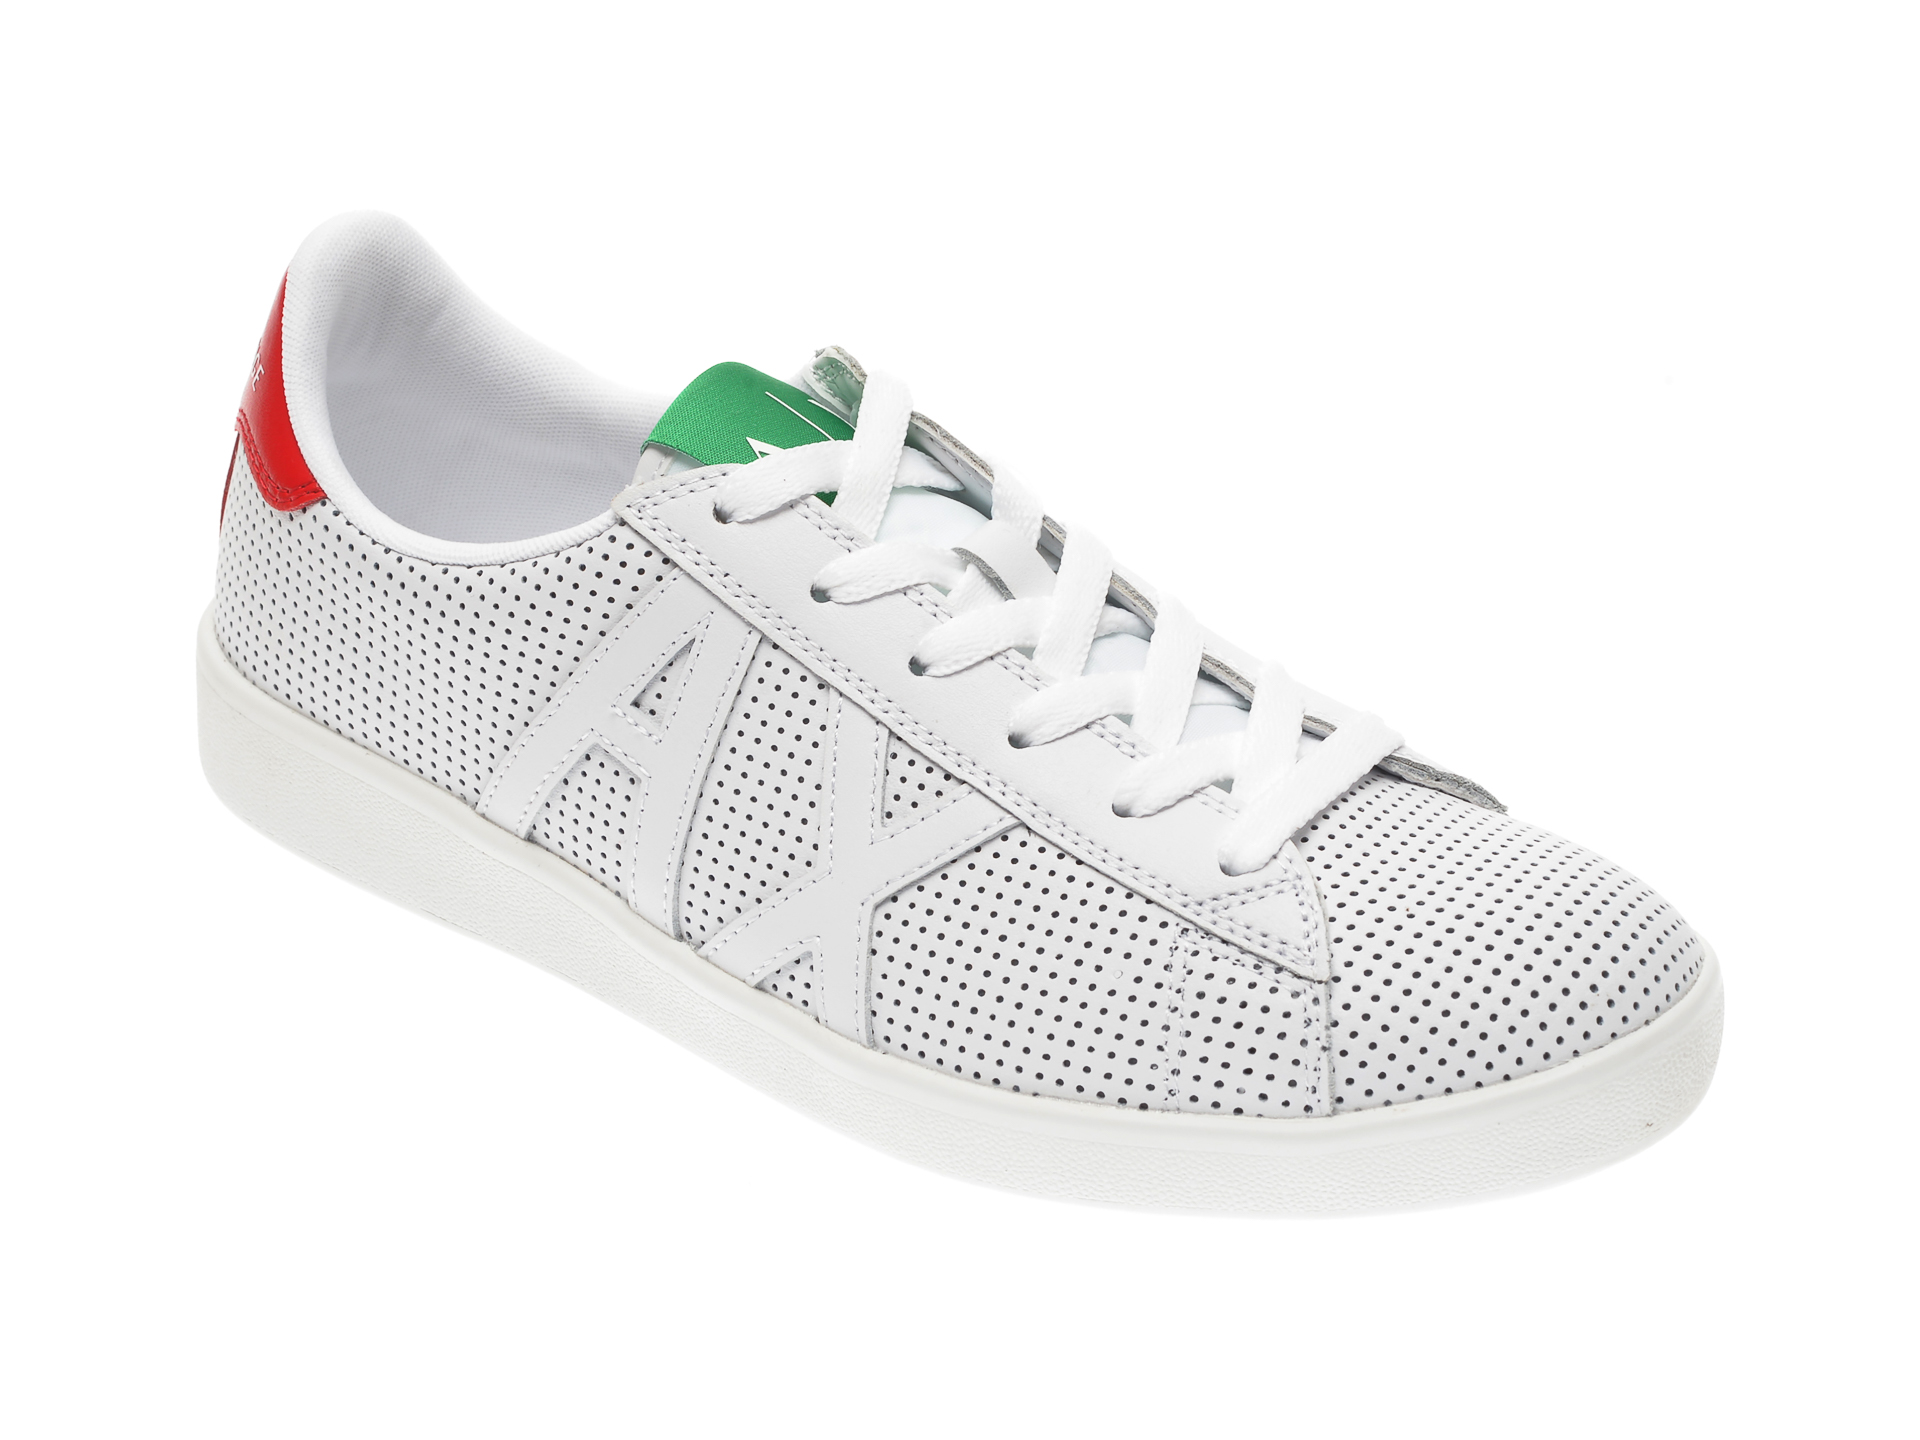 Pantofi ARMANI EXCHANGE albi, XUX016, din piele ecologica